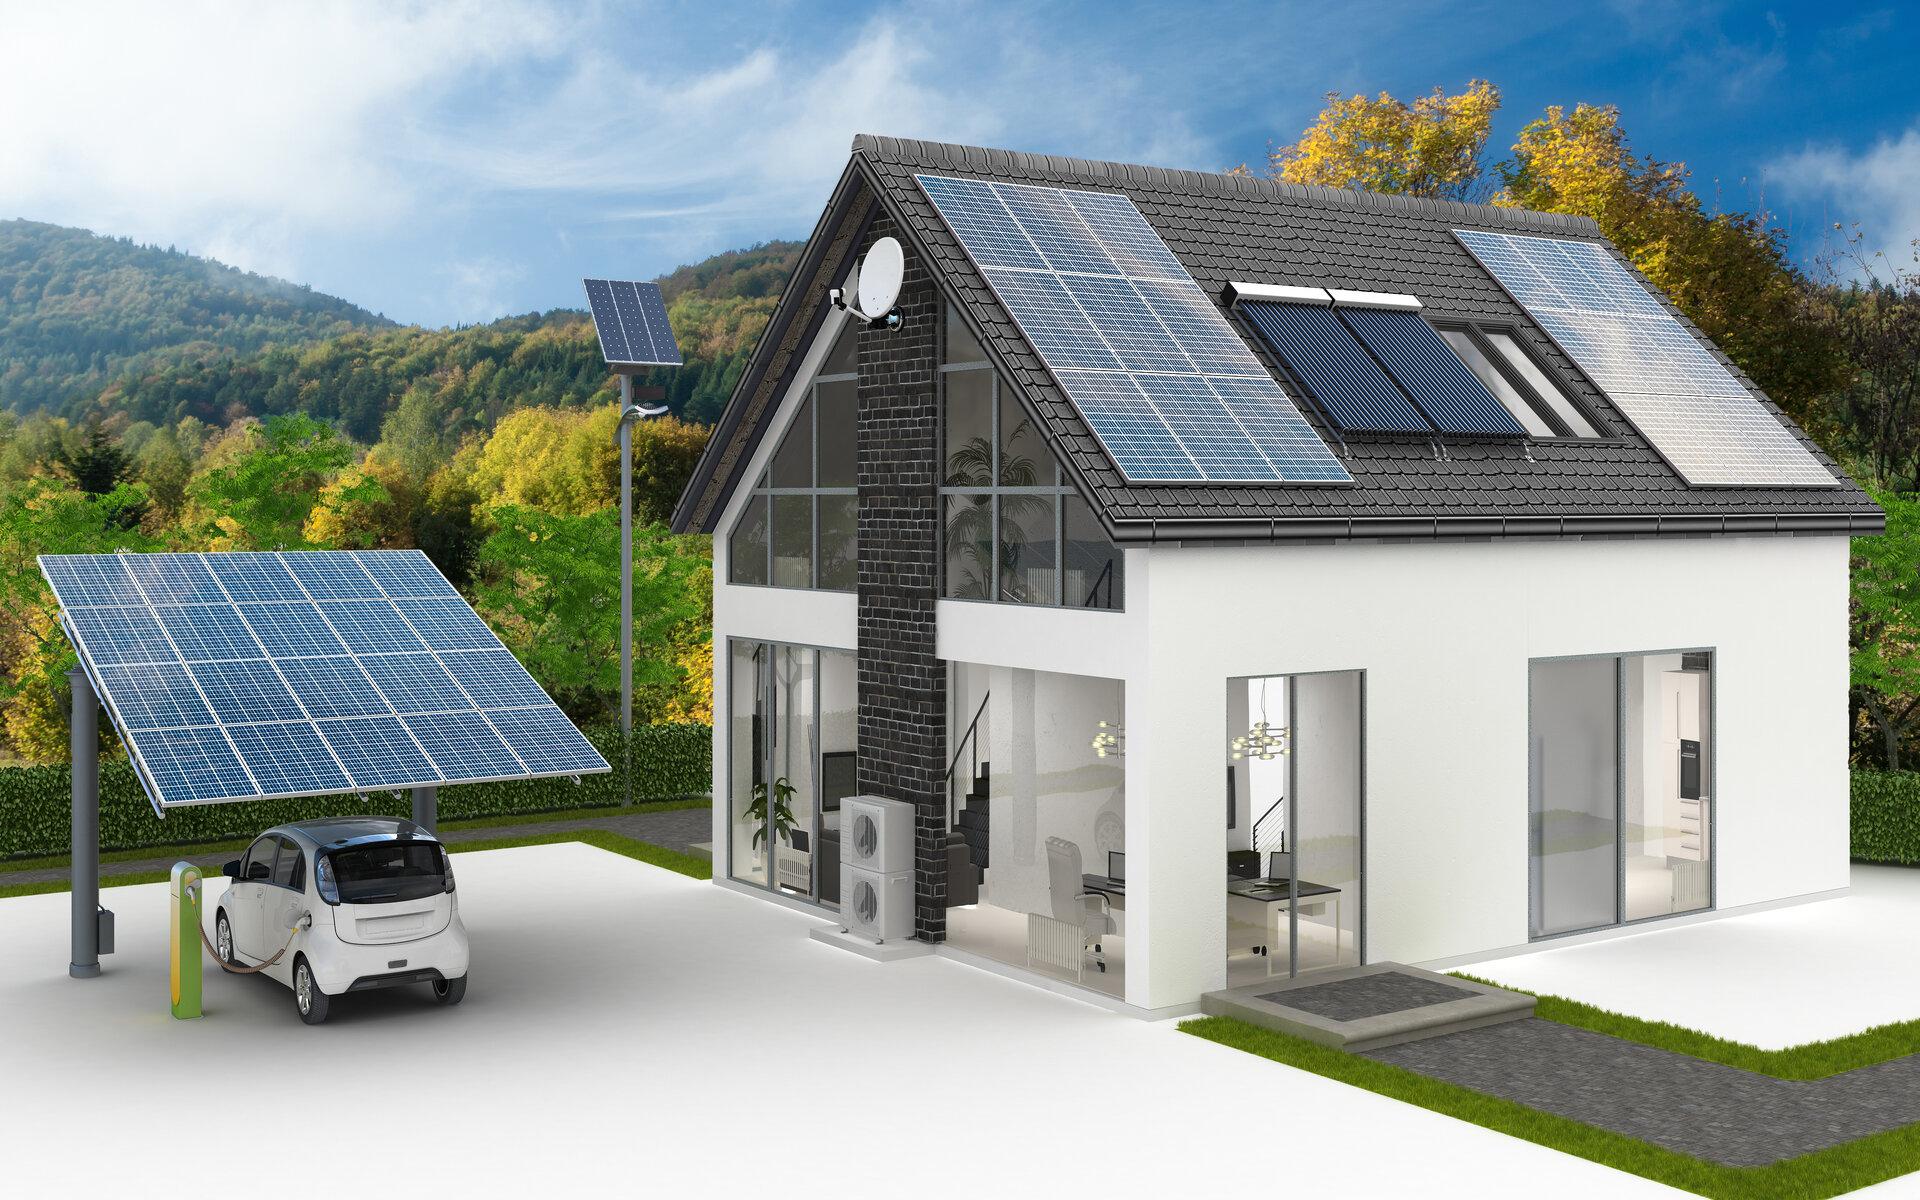 Fotovoltaica en Vivienda (1)